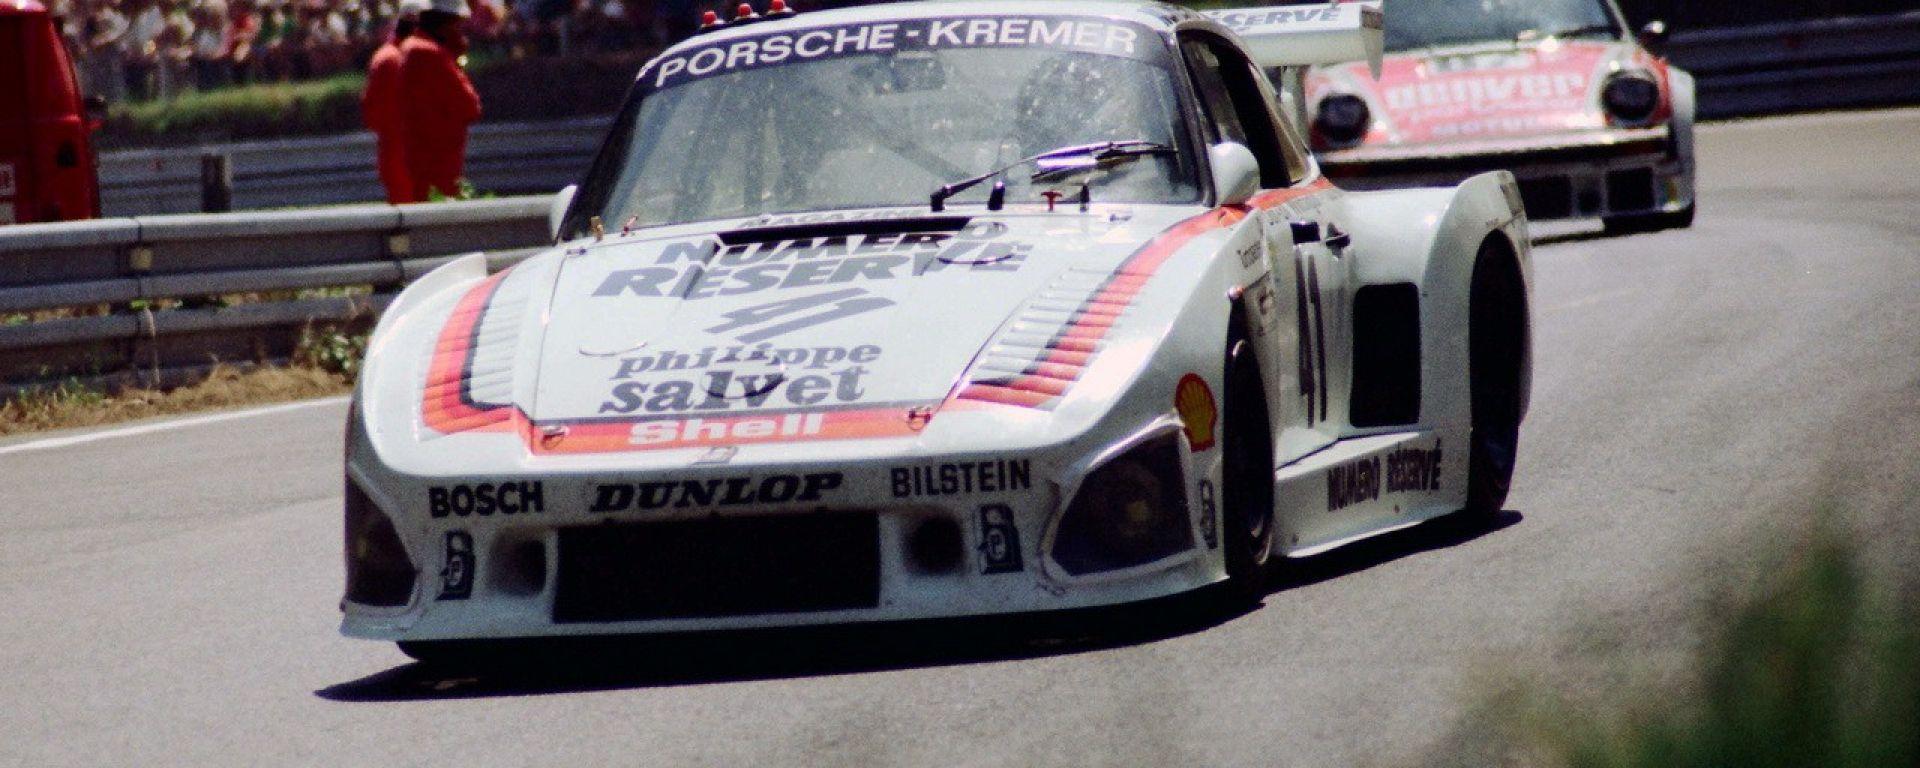 Porsche 935 K3 1979